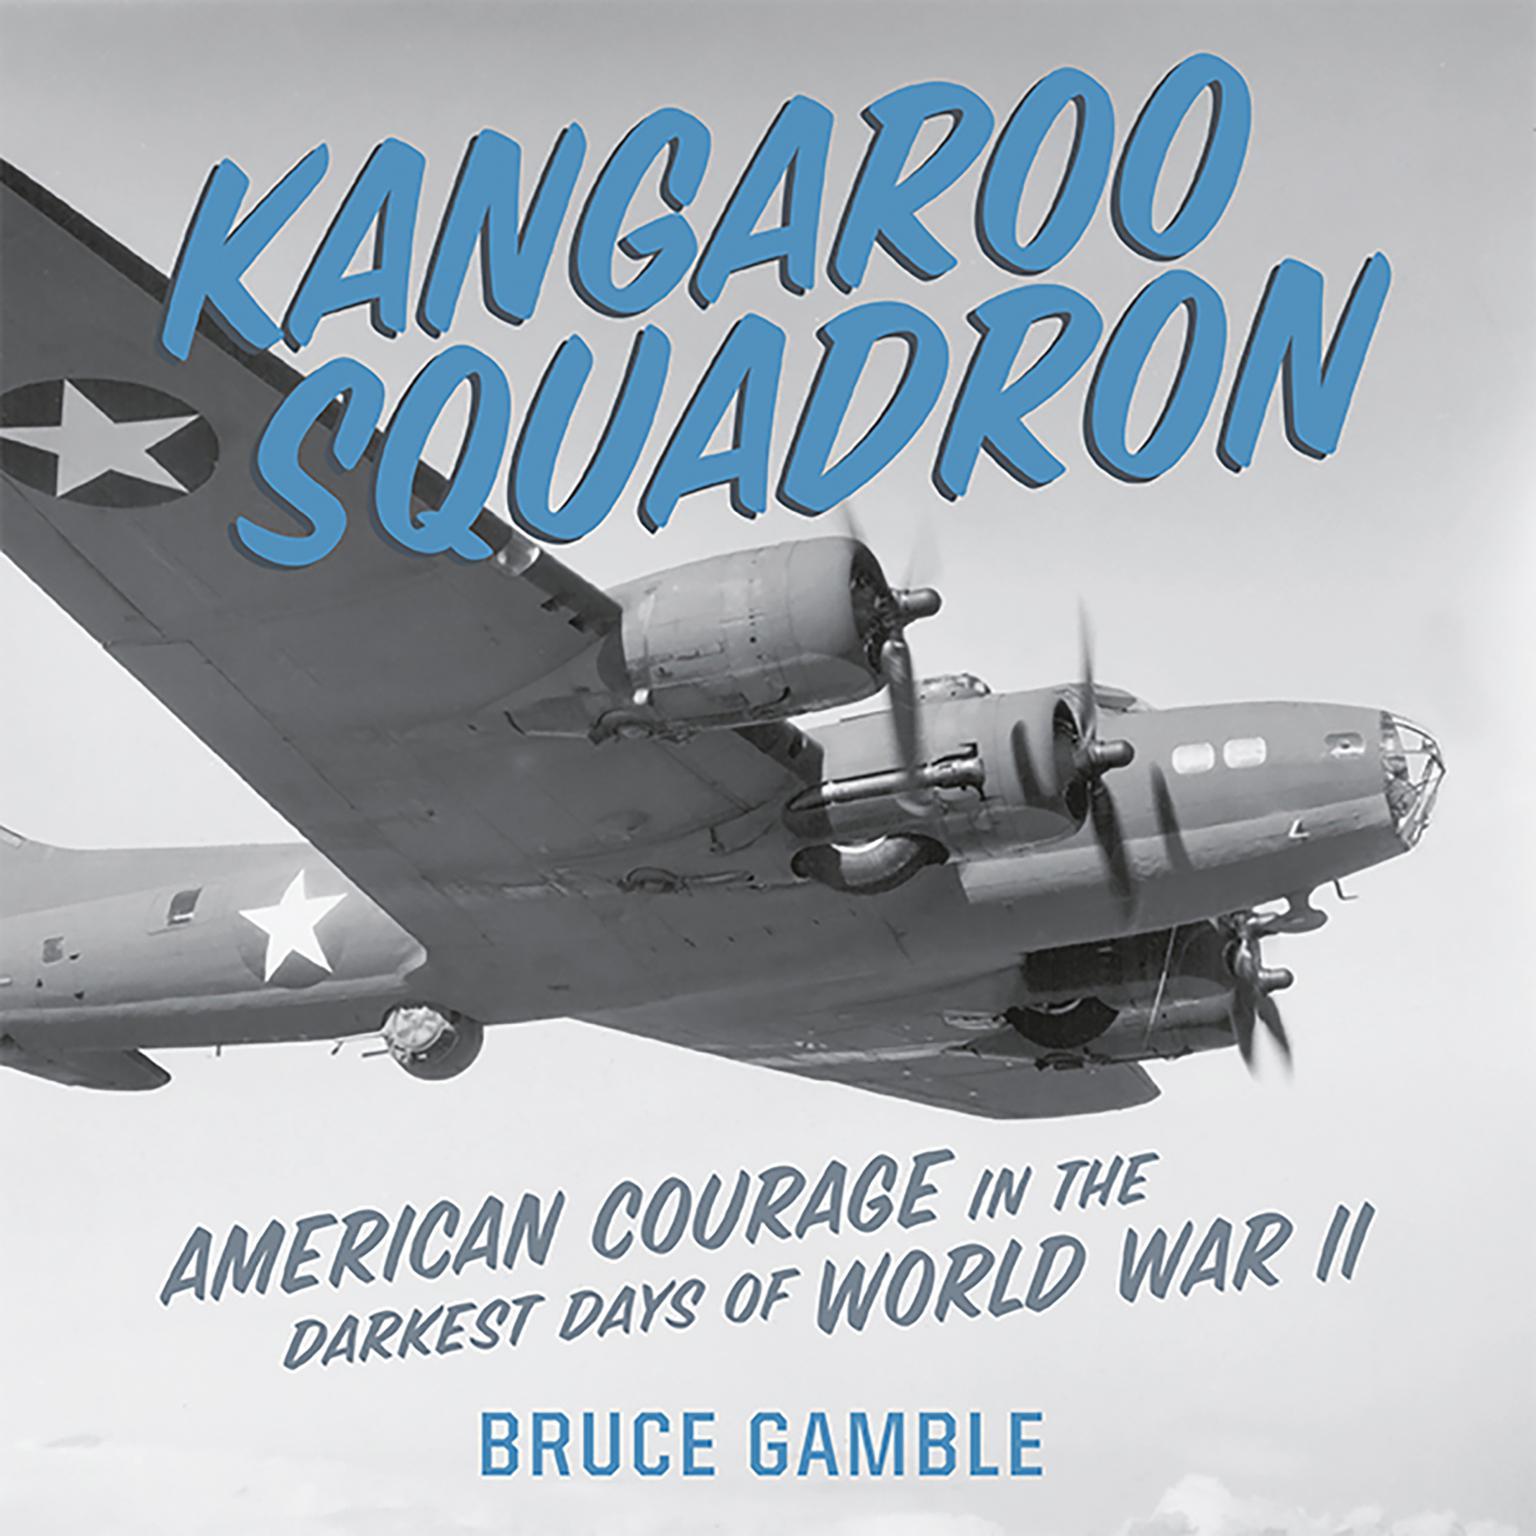 Printable Kangaroo Squadron: American Courage in the Darkest Days of World War II Audiobook Cover Art